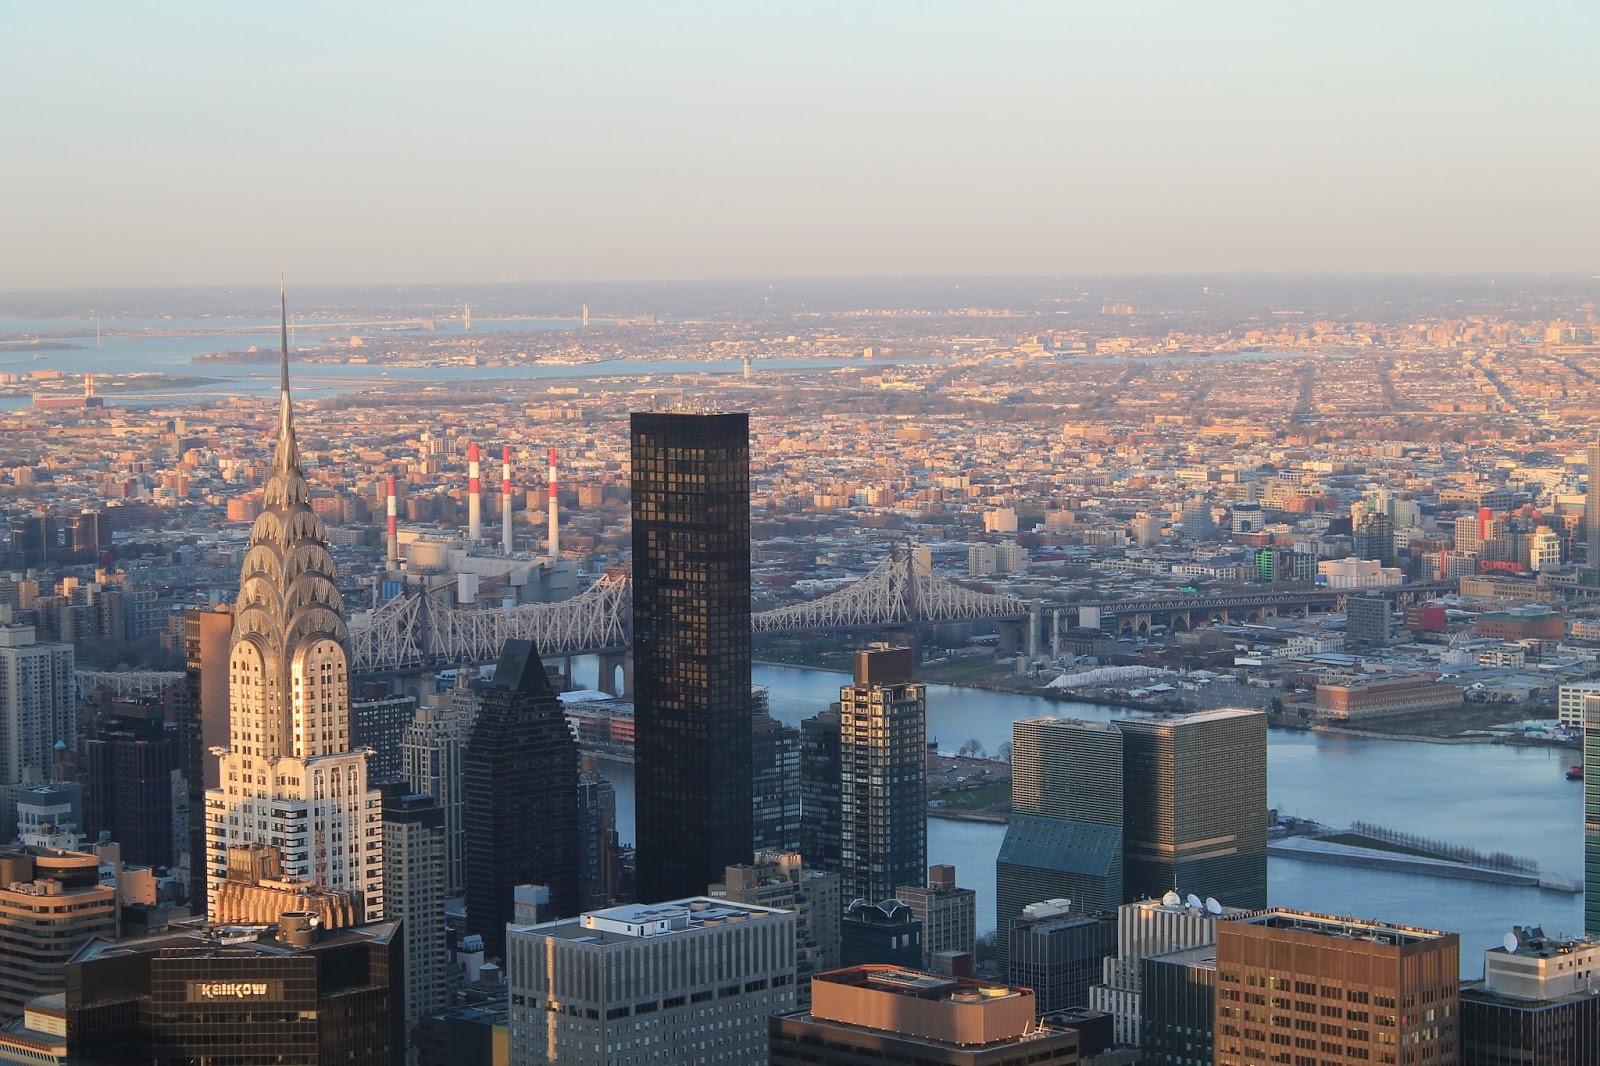 usa, nyc, new york, city, empire state building, top, vue, panorama, panoramique, coucher de soleil, sunshine, soleil, voyage, trip2live, road trip, holidays, airbnb, ceetiz, sky